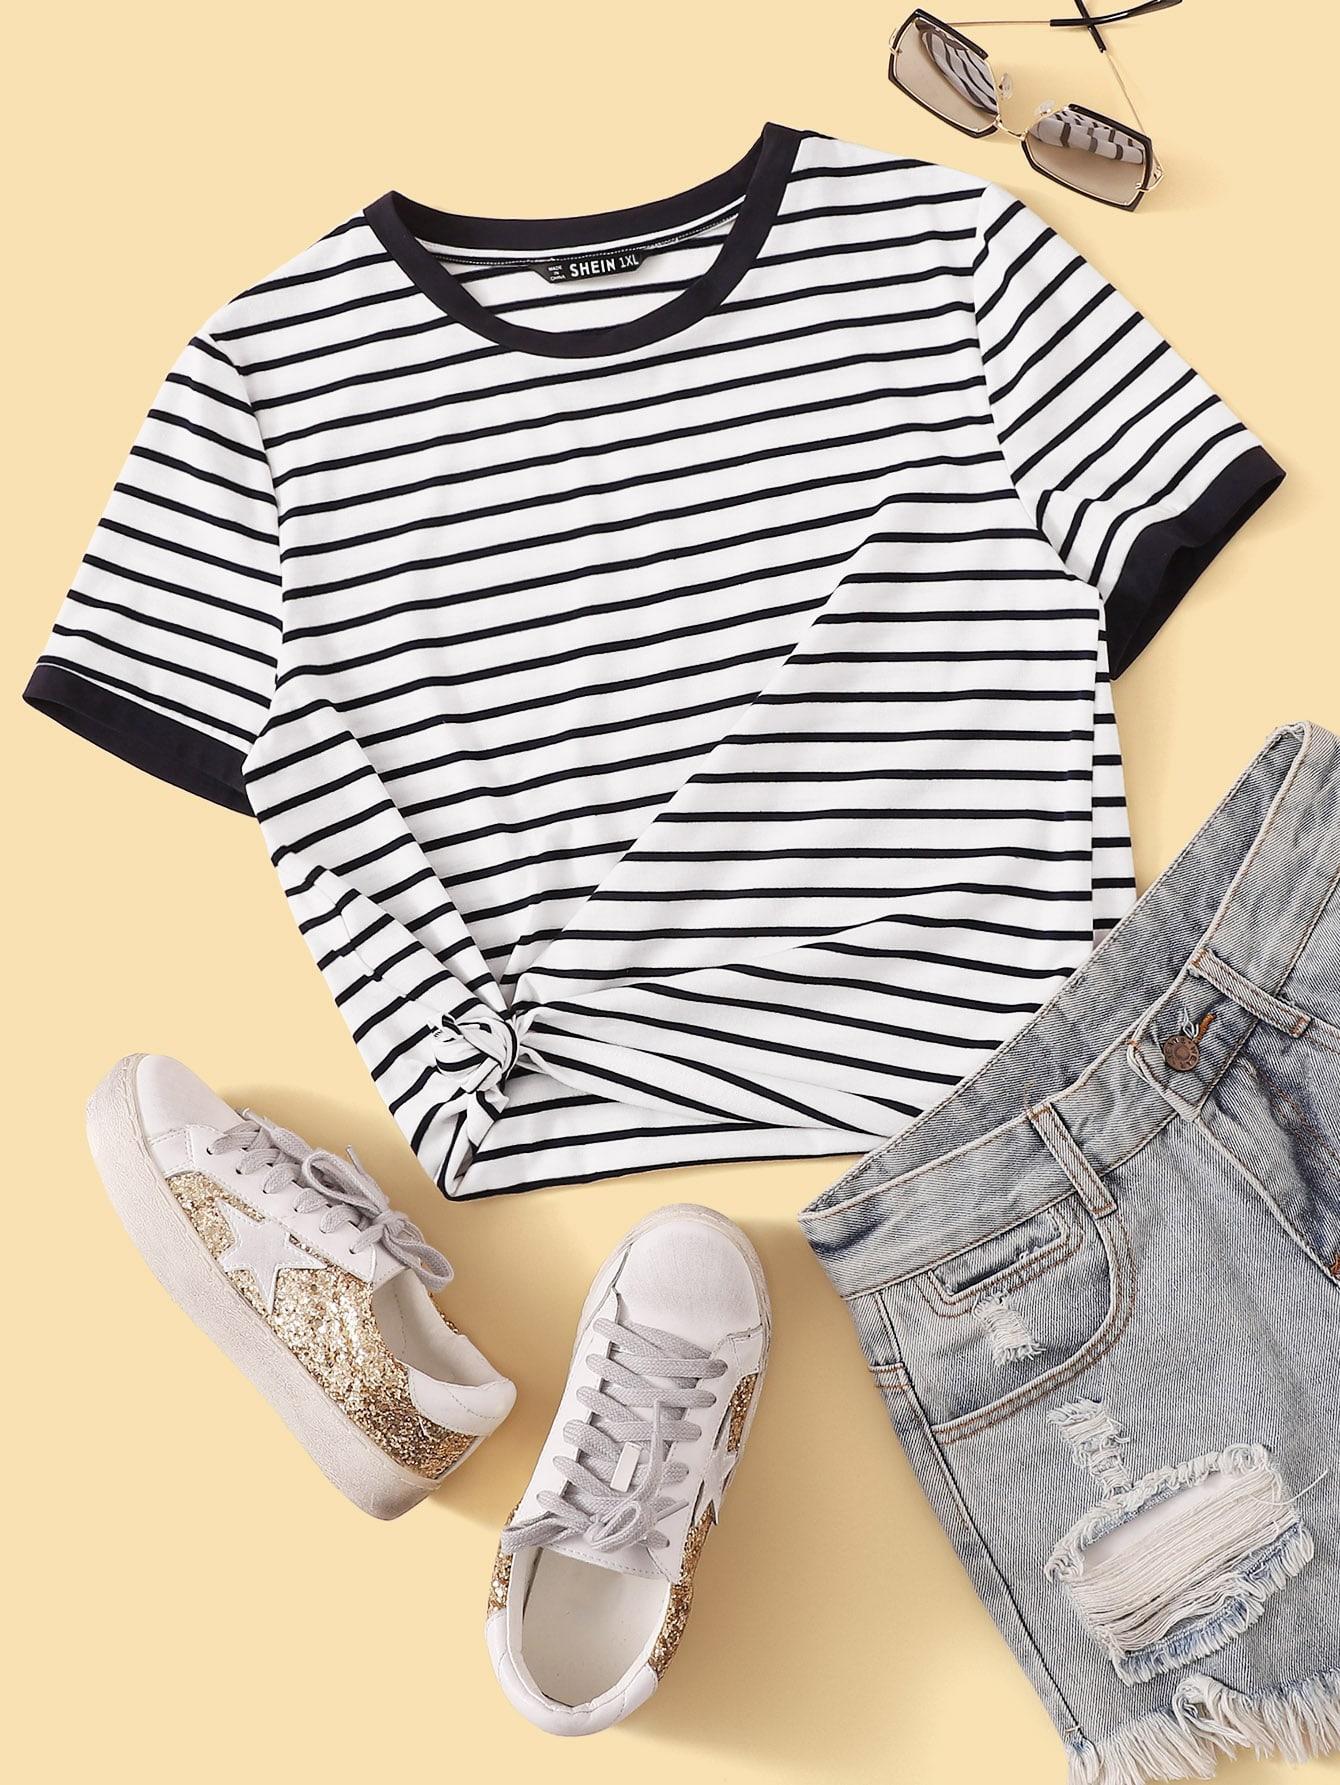 Фото 6 - Однотонная футболка с кулиской от SheIn белого цвета